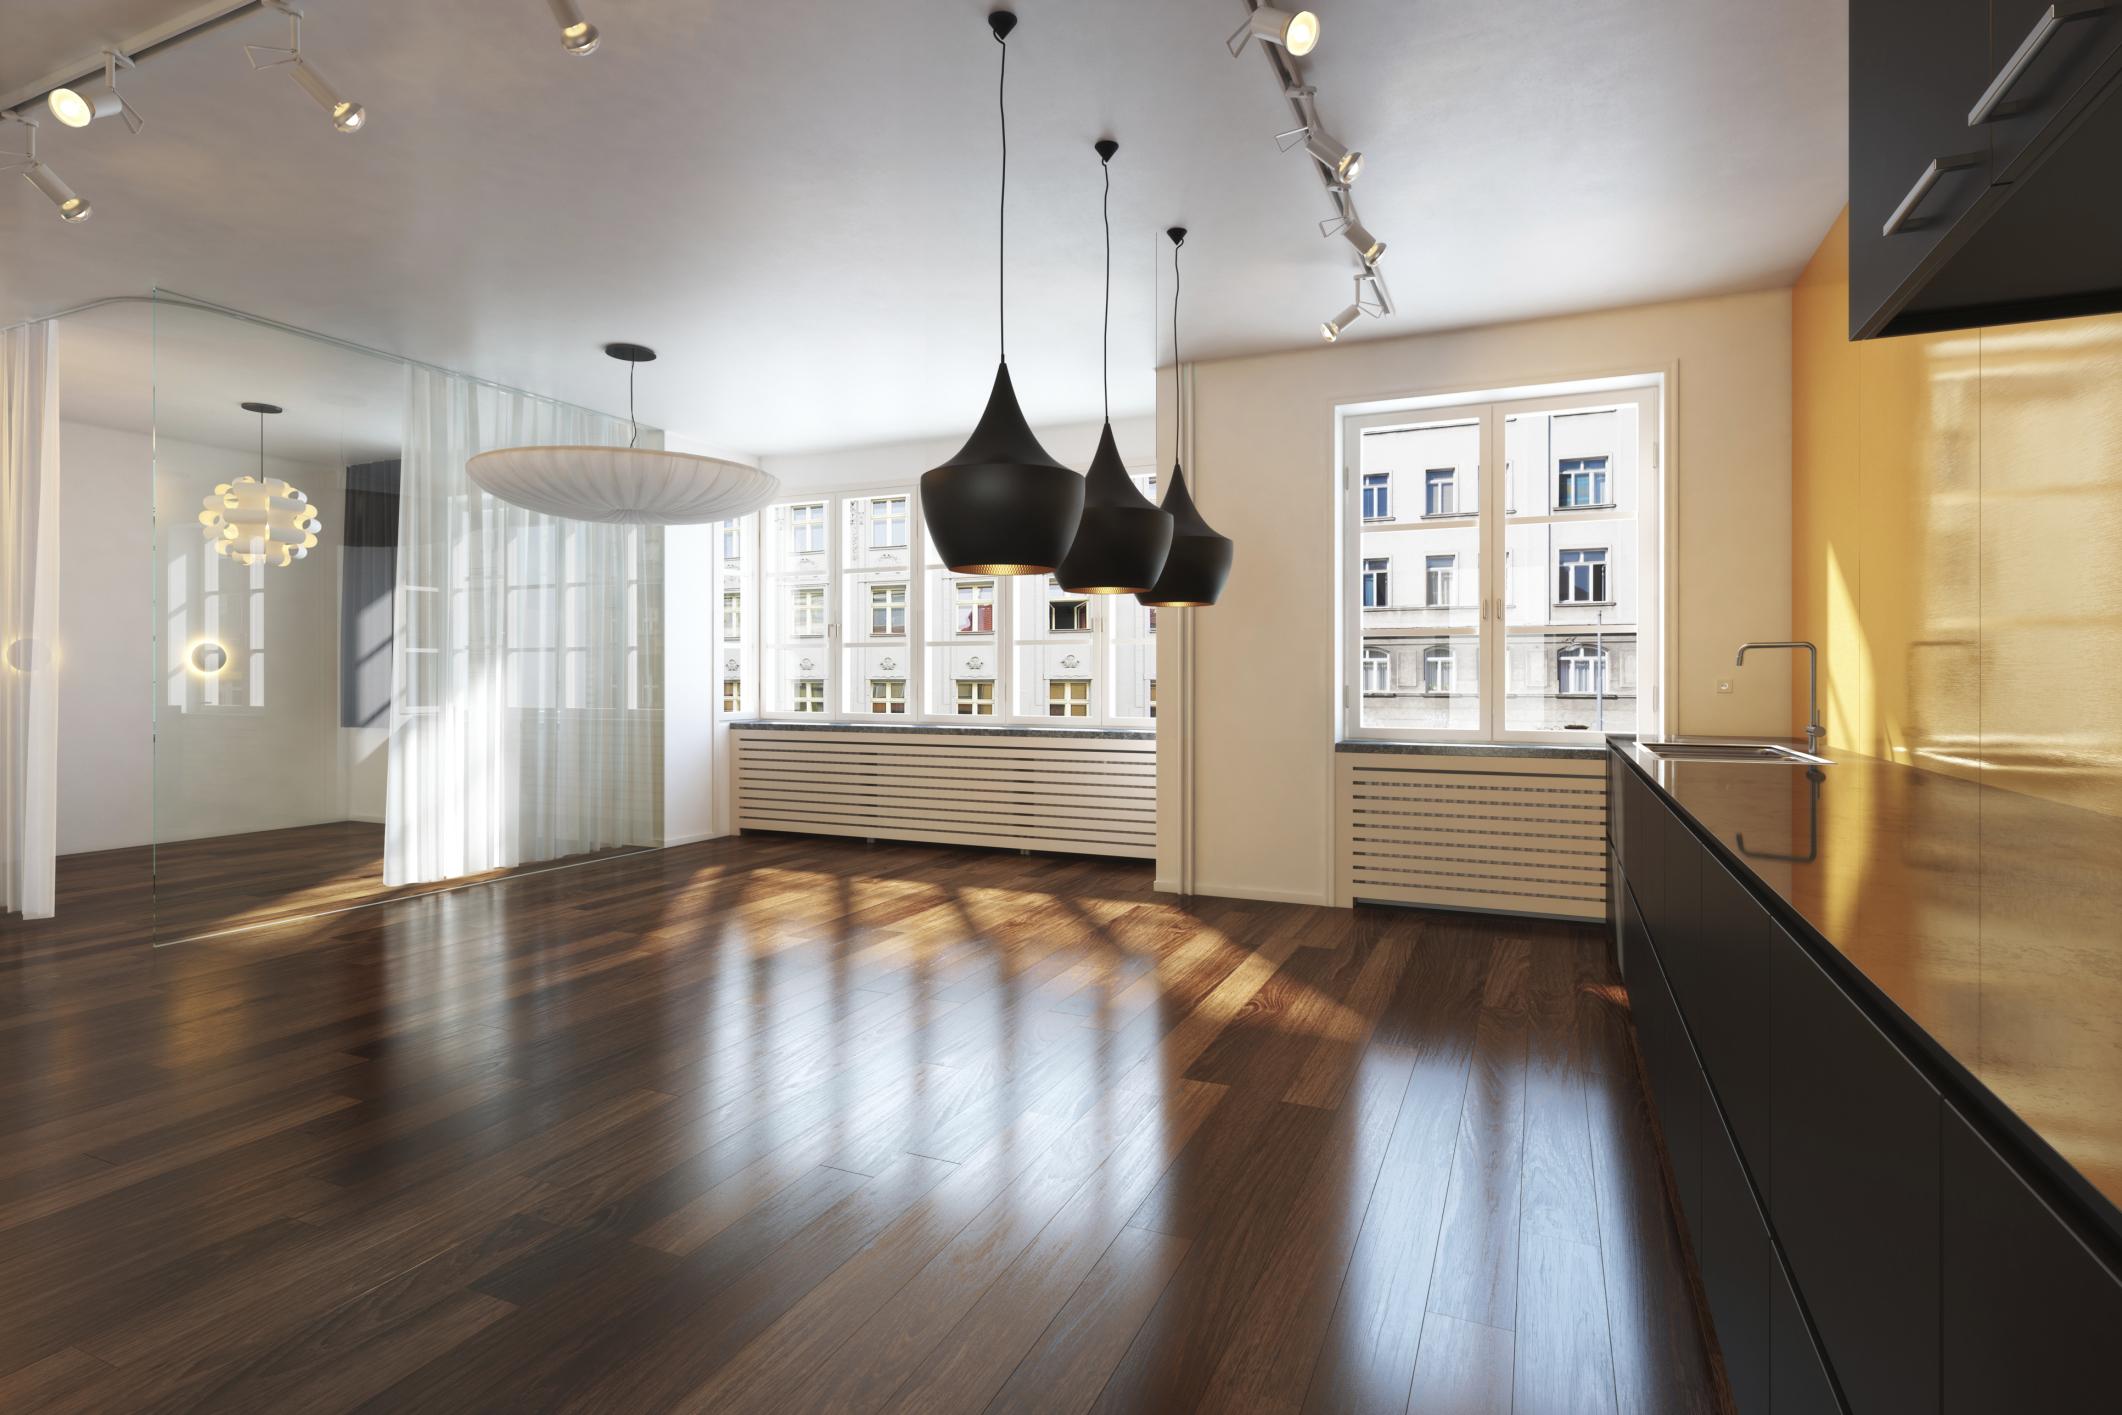 Acrylic Urethane Floor Paint | Floor Matttroy